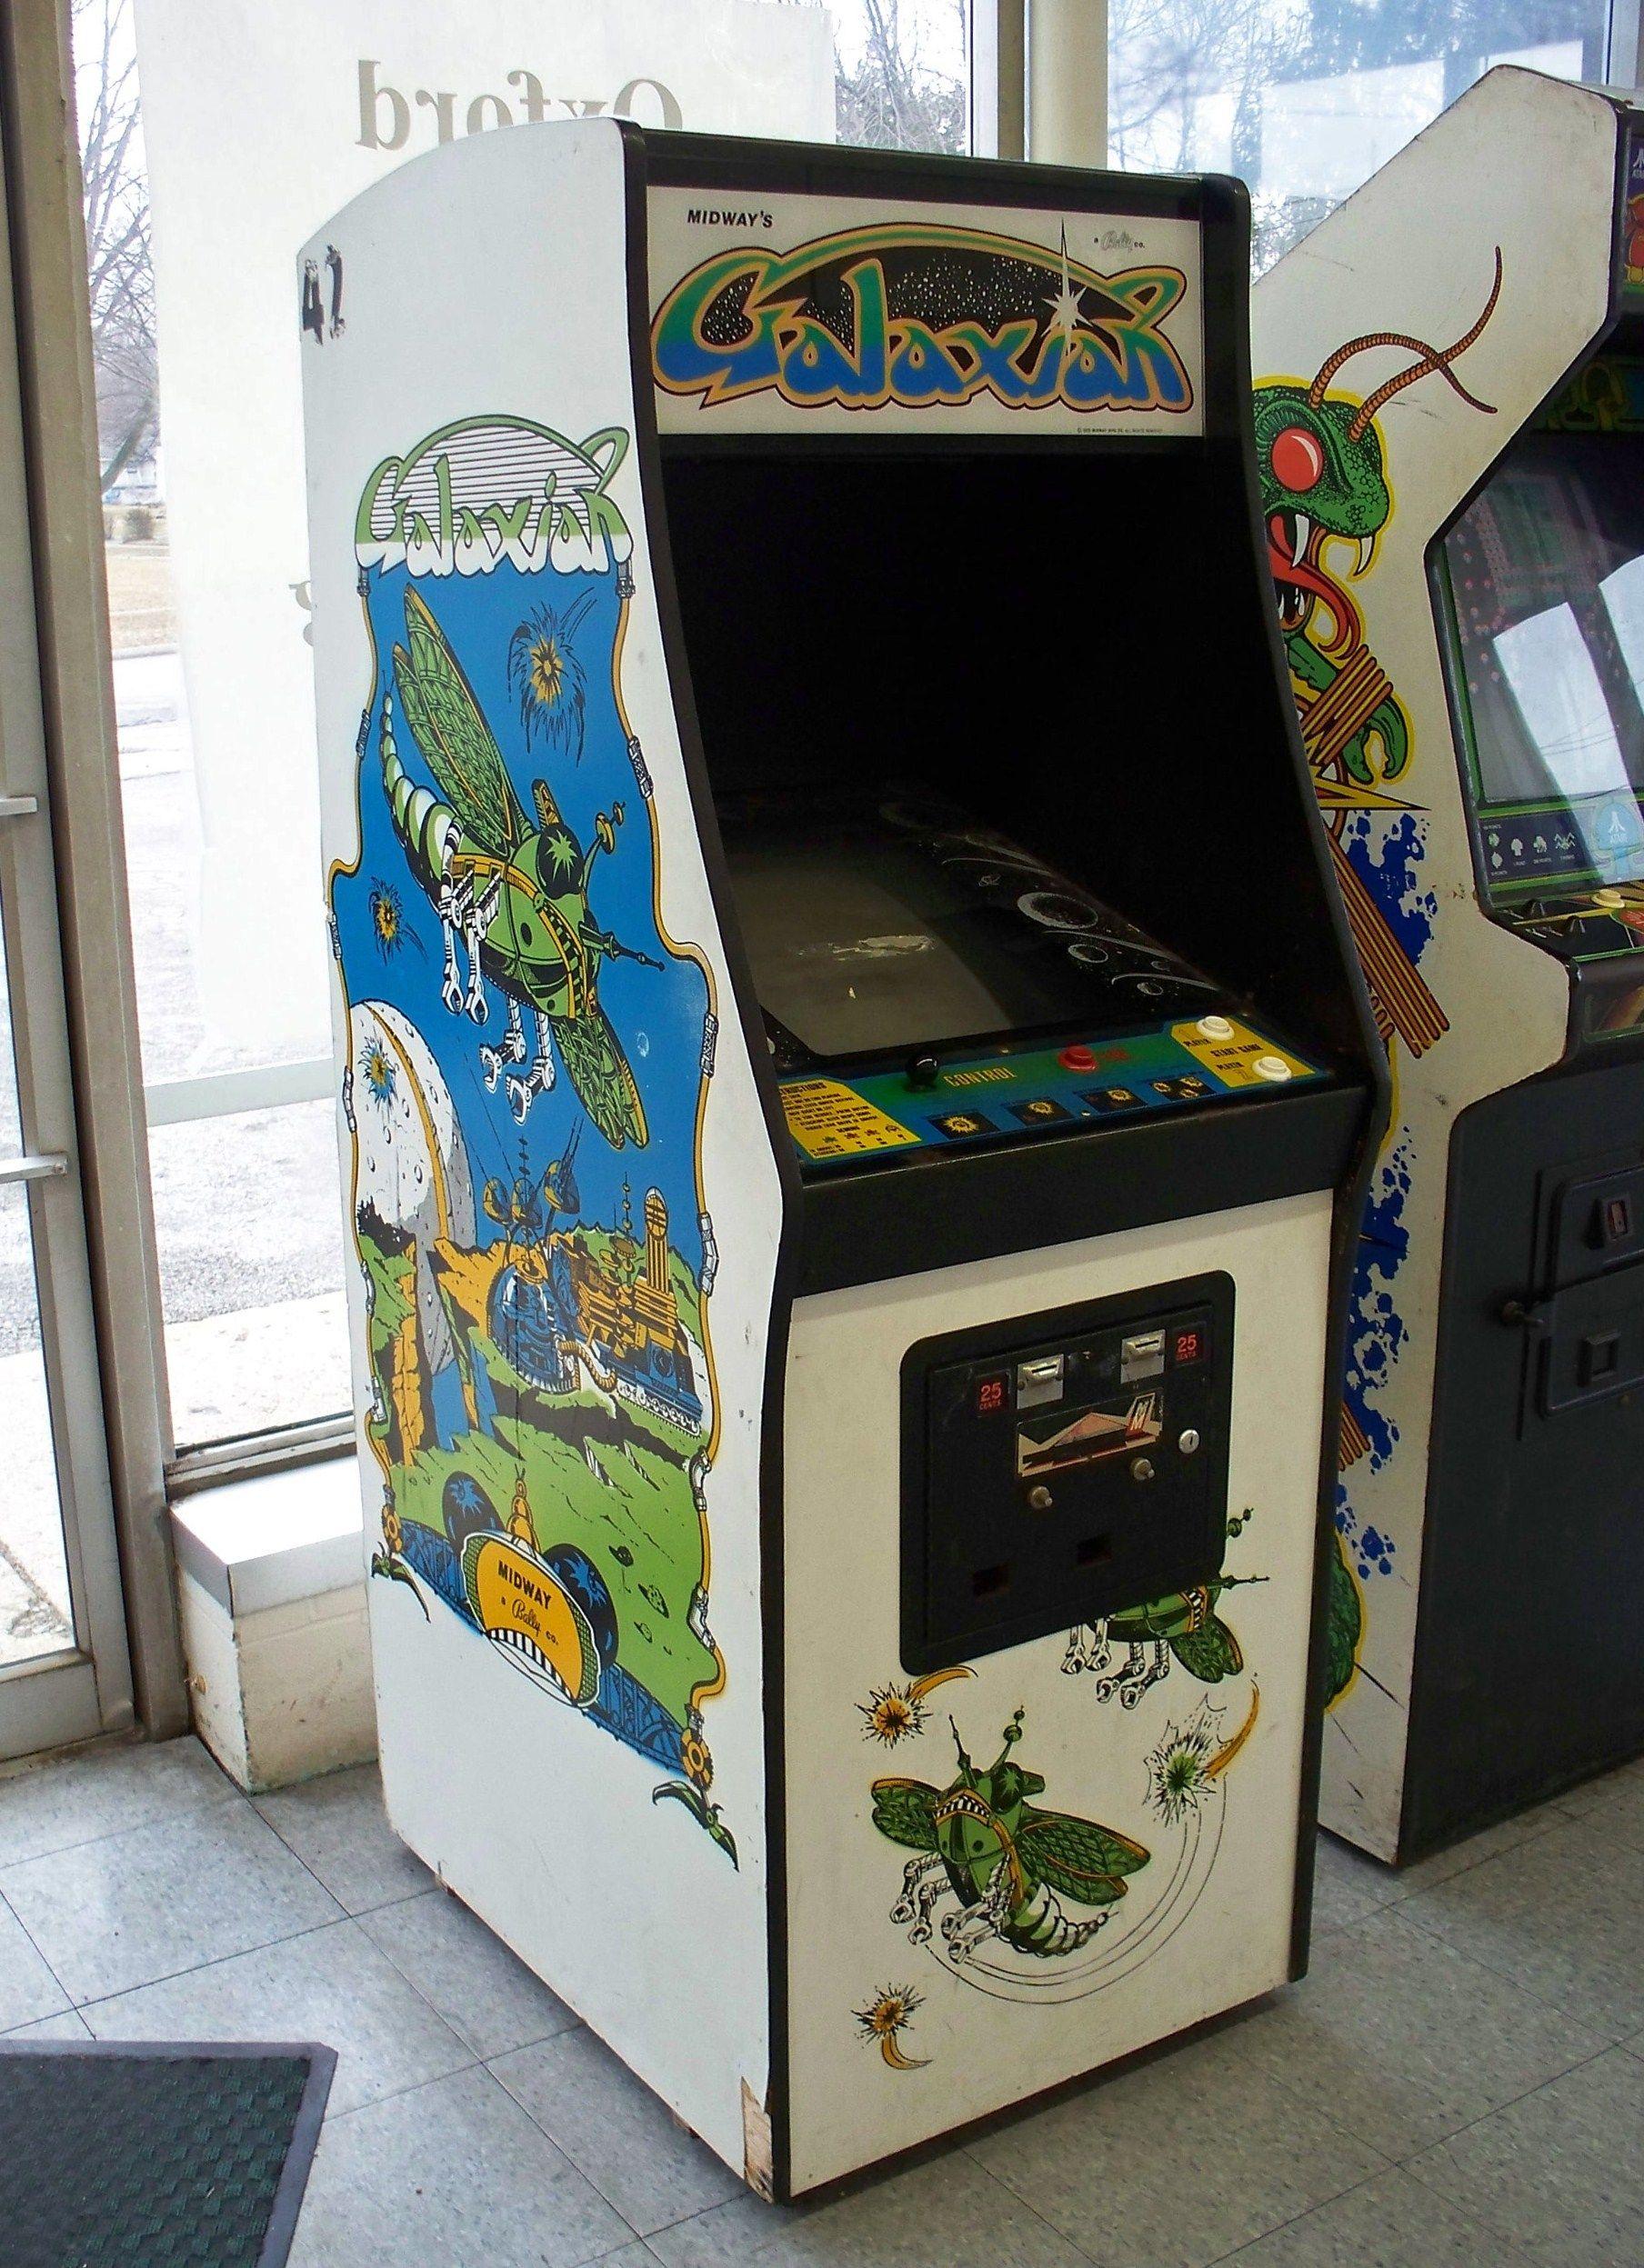 Grove City Galaxian Vintage video games, Arcade games